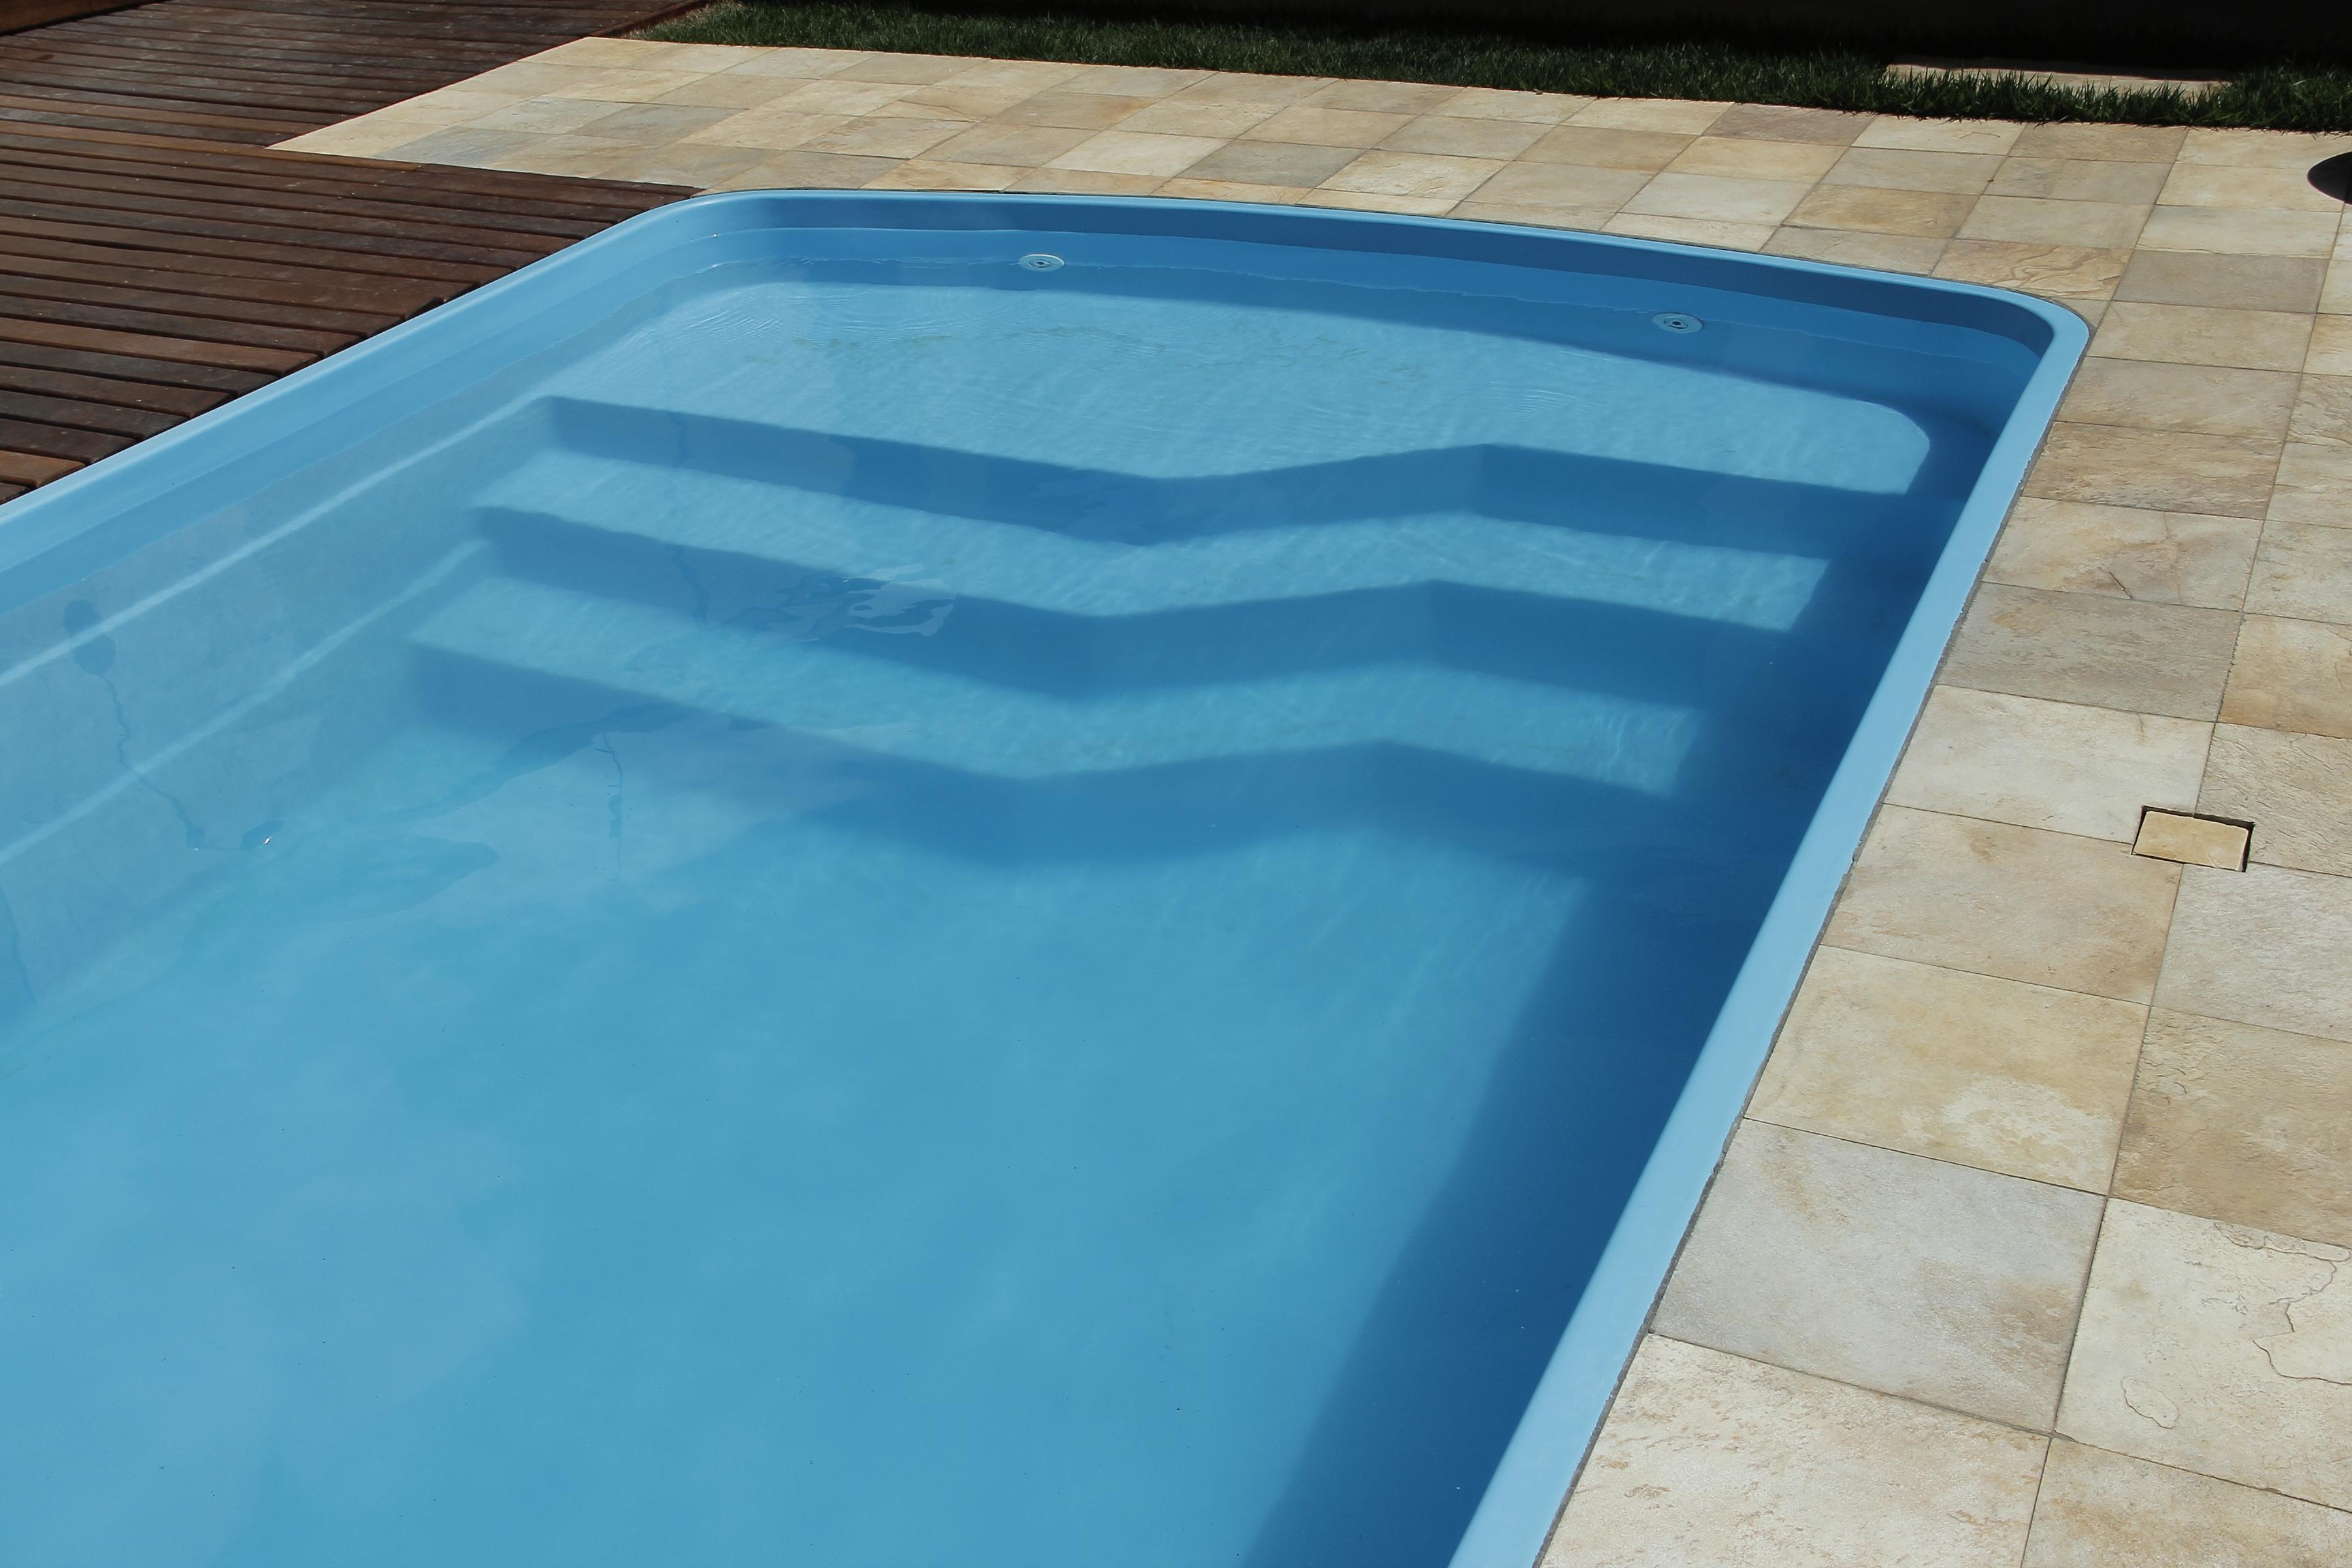 Piscinas de fibra bh mg piscina piscinas bh modelos for Piscina para casa medidas